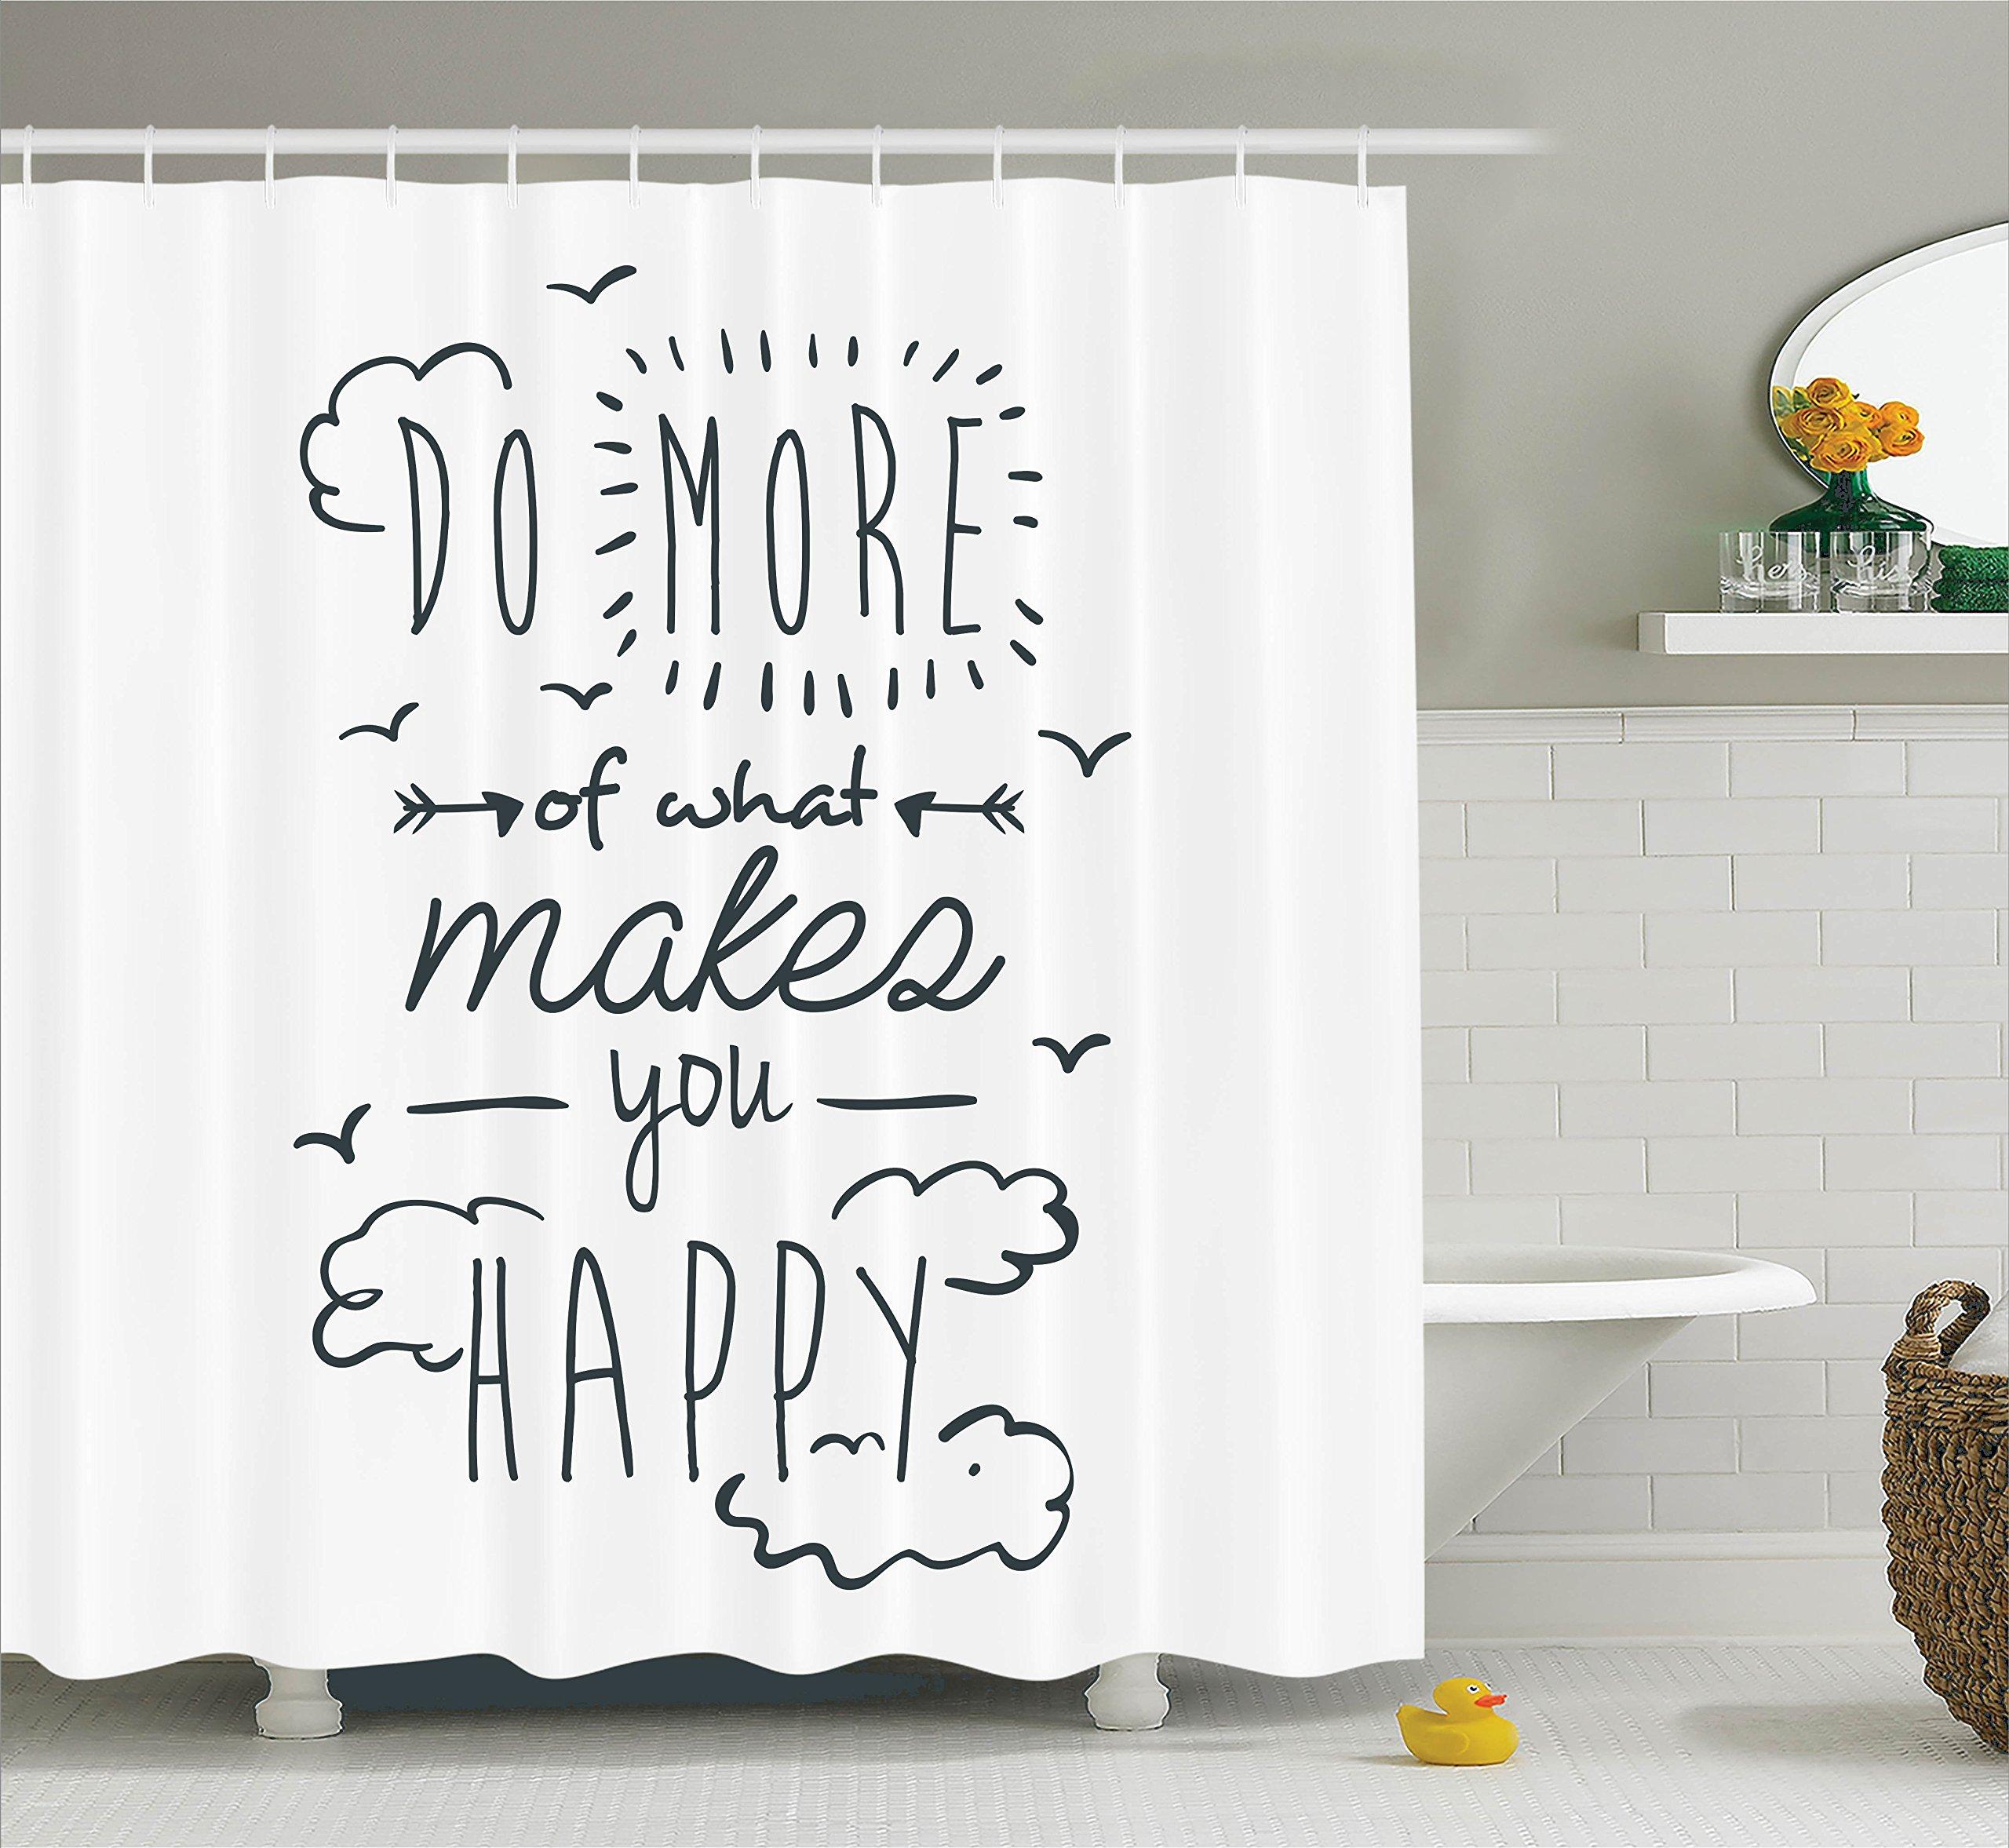 Inspirational Quotes for Bathroom: Amazon.com